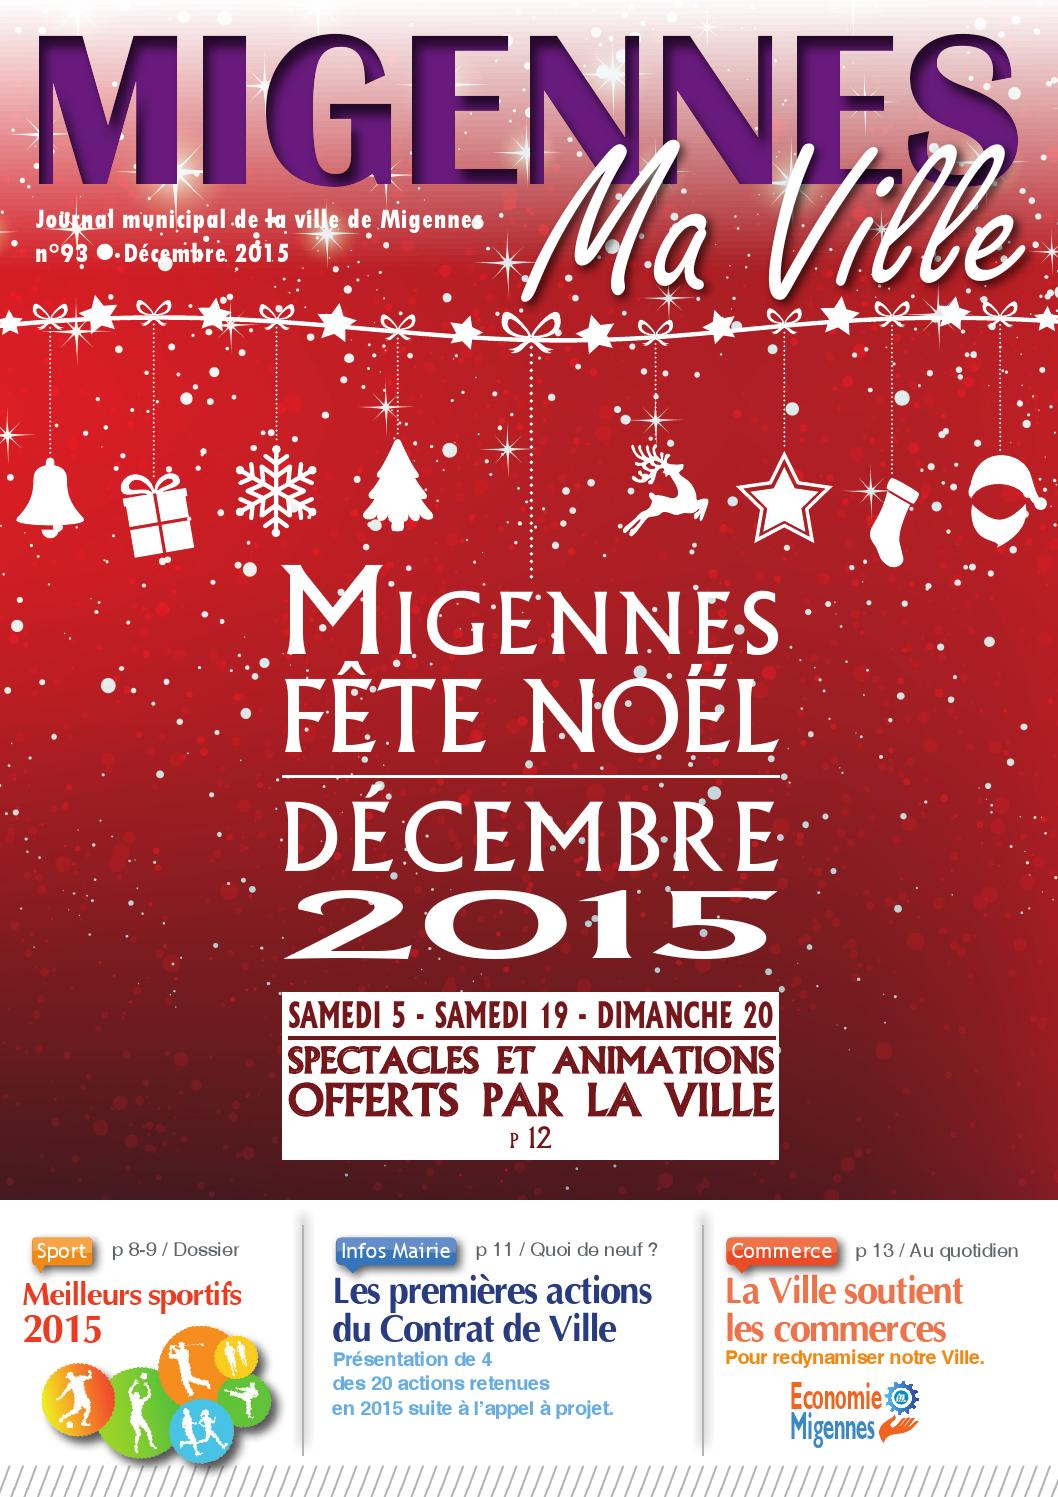 by 93 Migmaville hd 2015 Ville issuu Migennes de decembre MGLVSUqzp